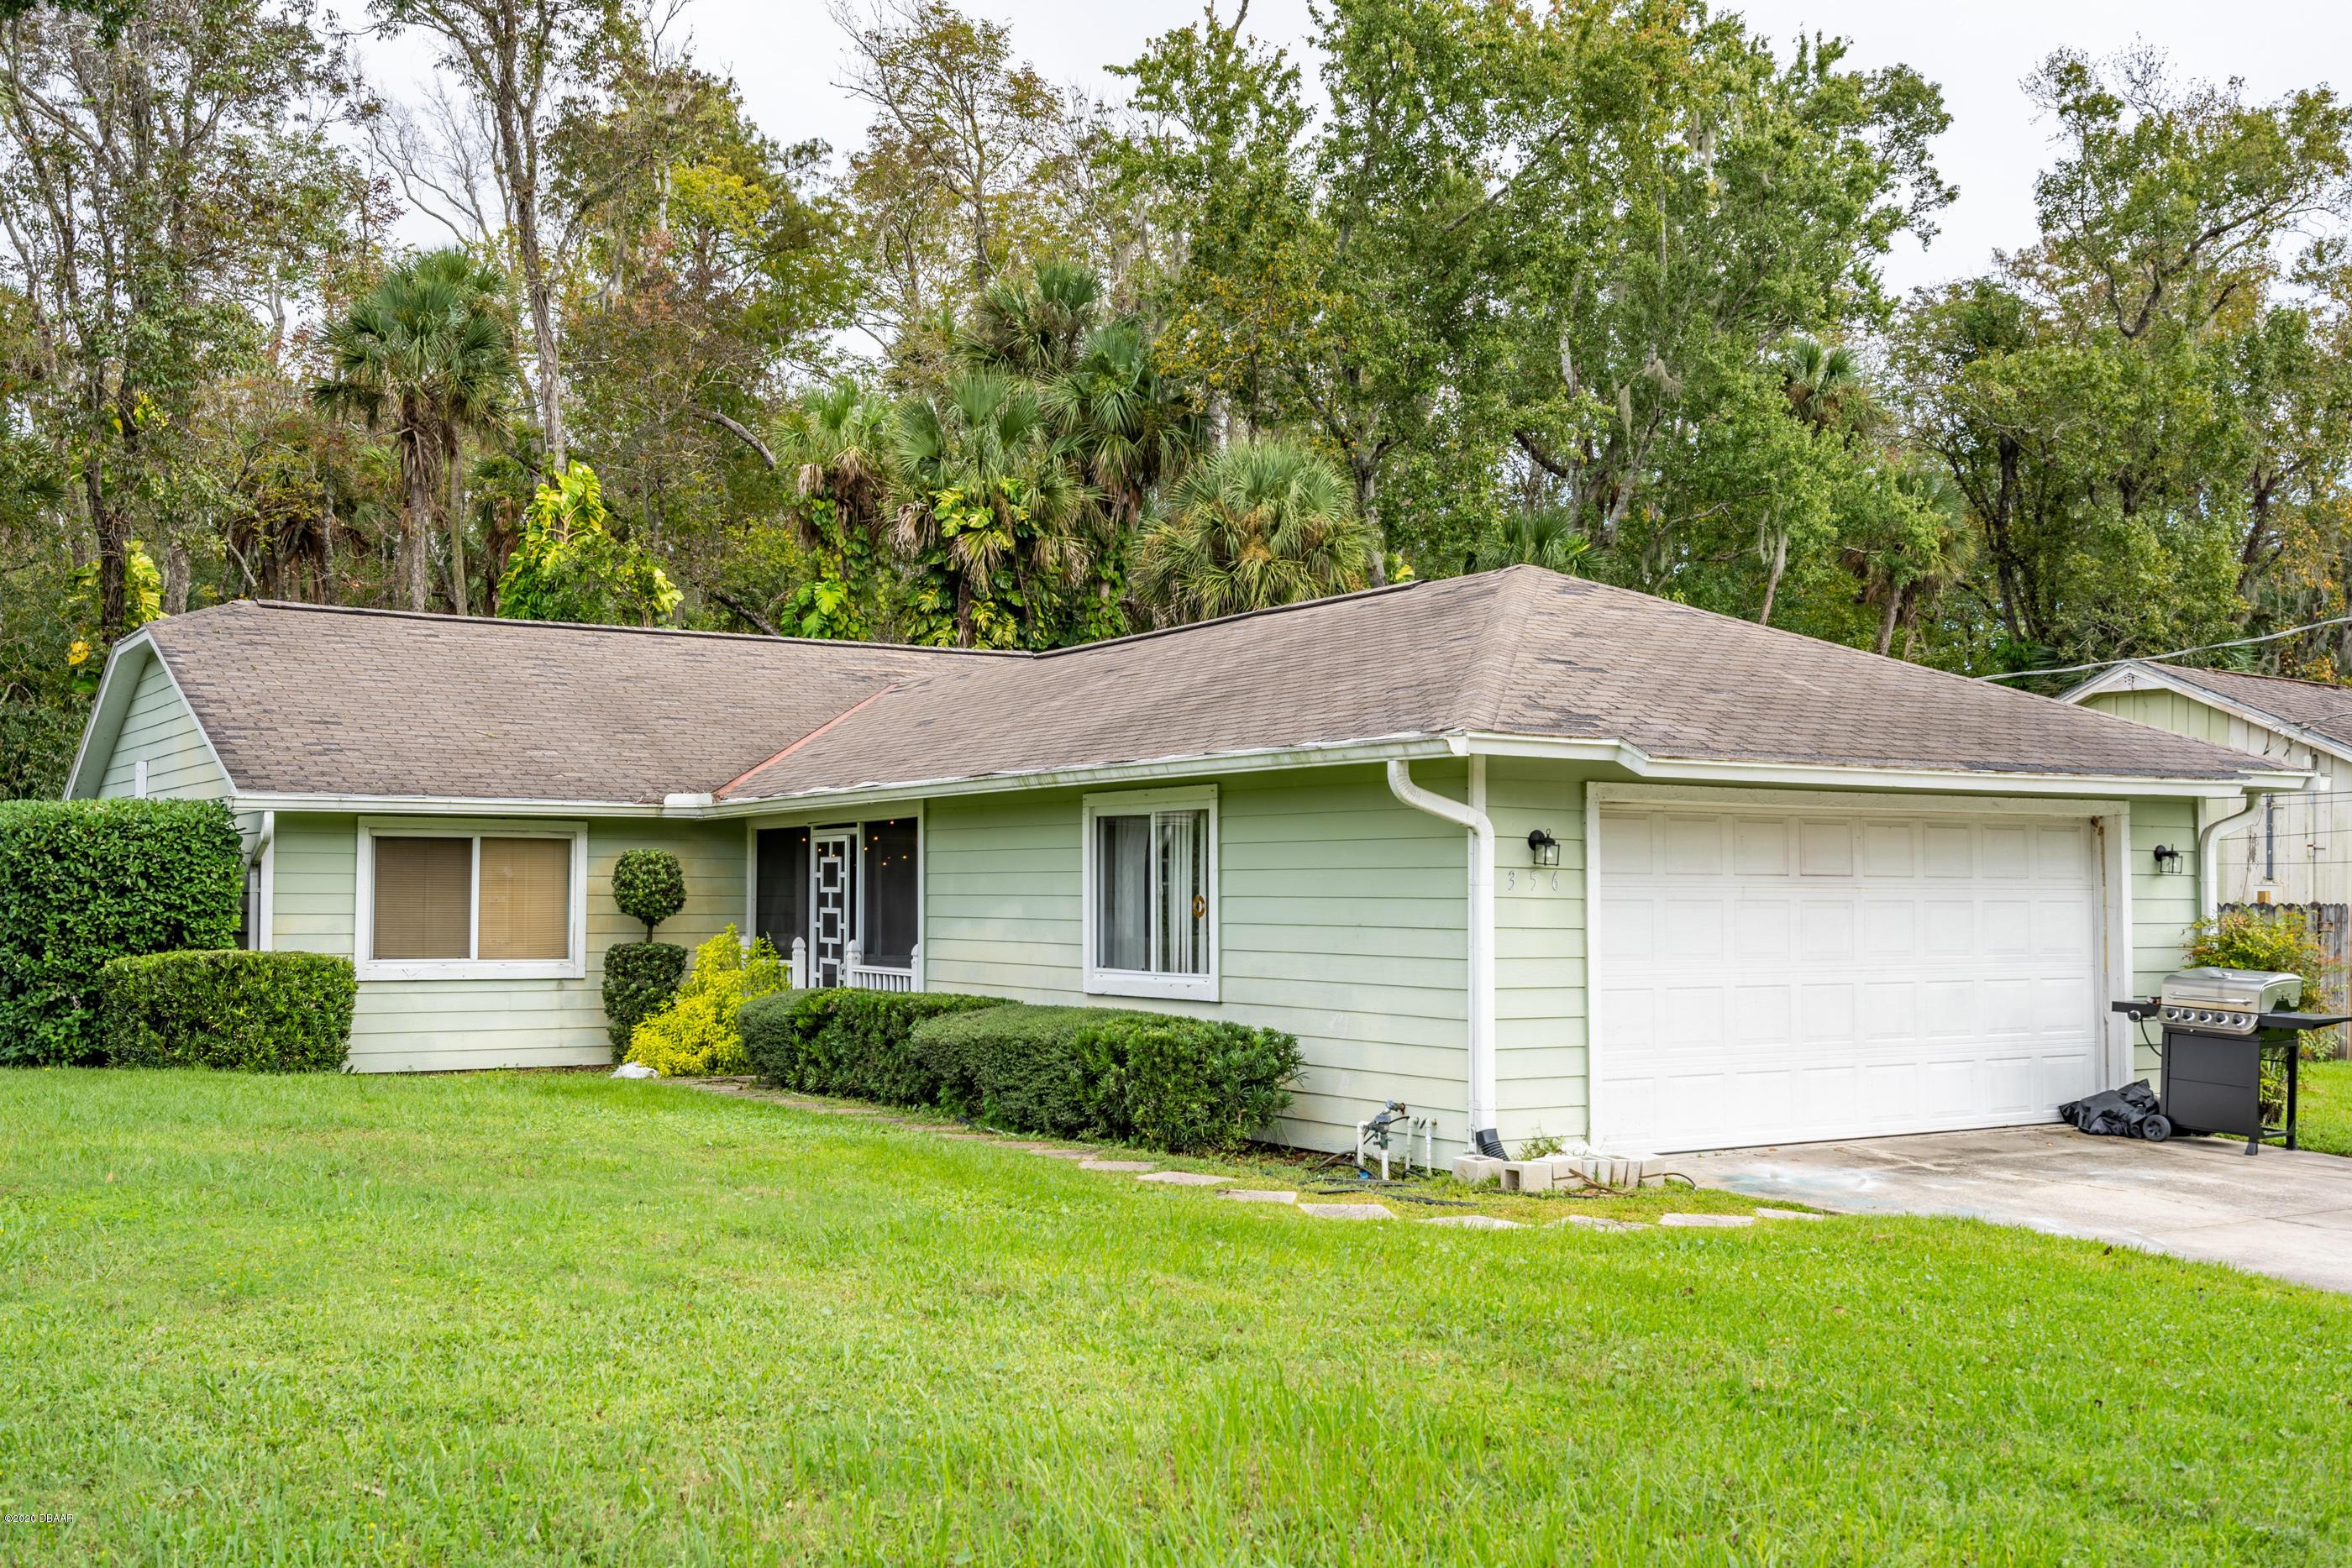 Photo of 356 Seminole Drive, Ormond Beach, FL 32174